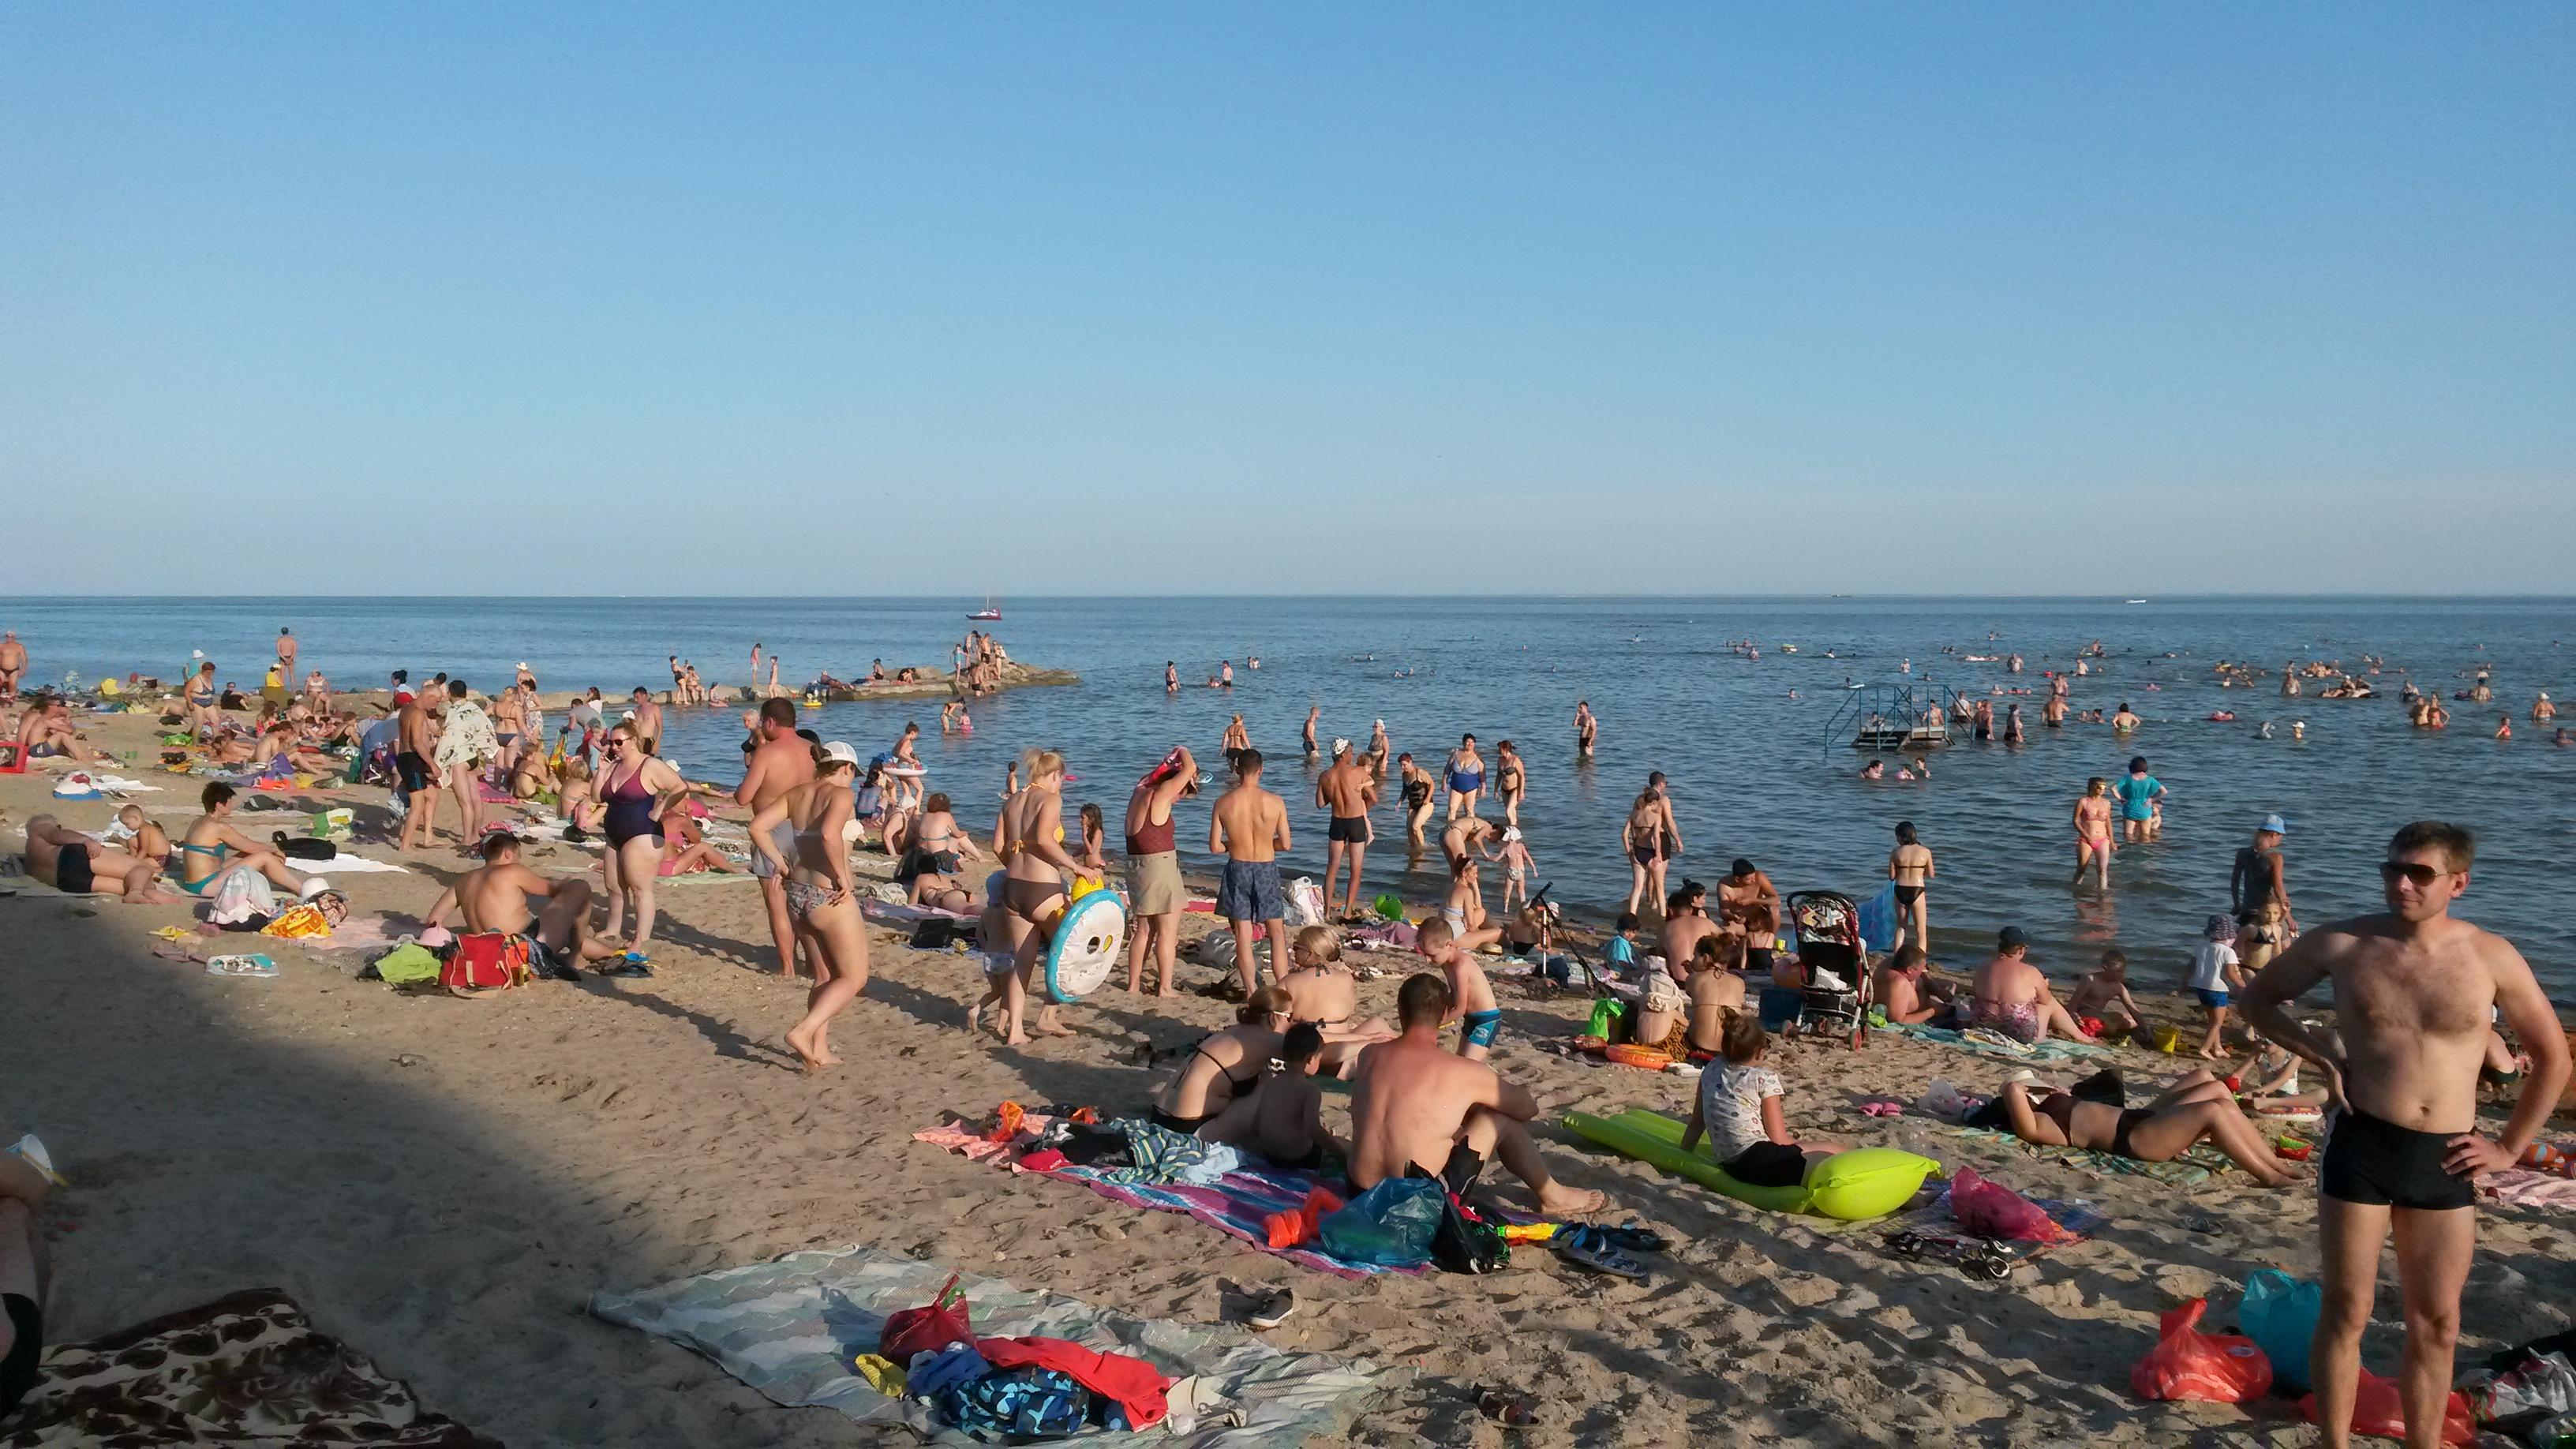 Лето, Солнце, пляж